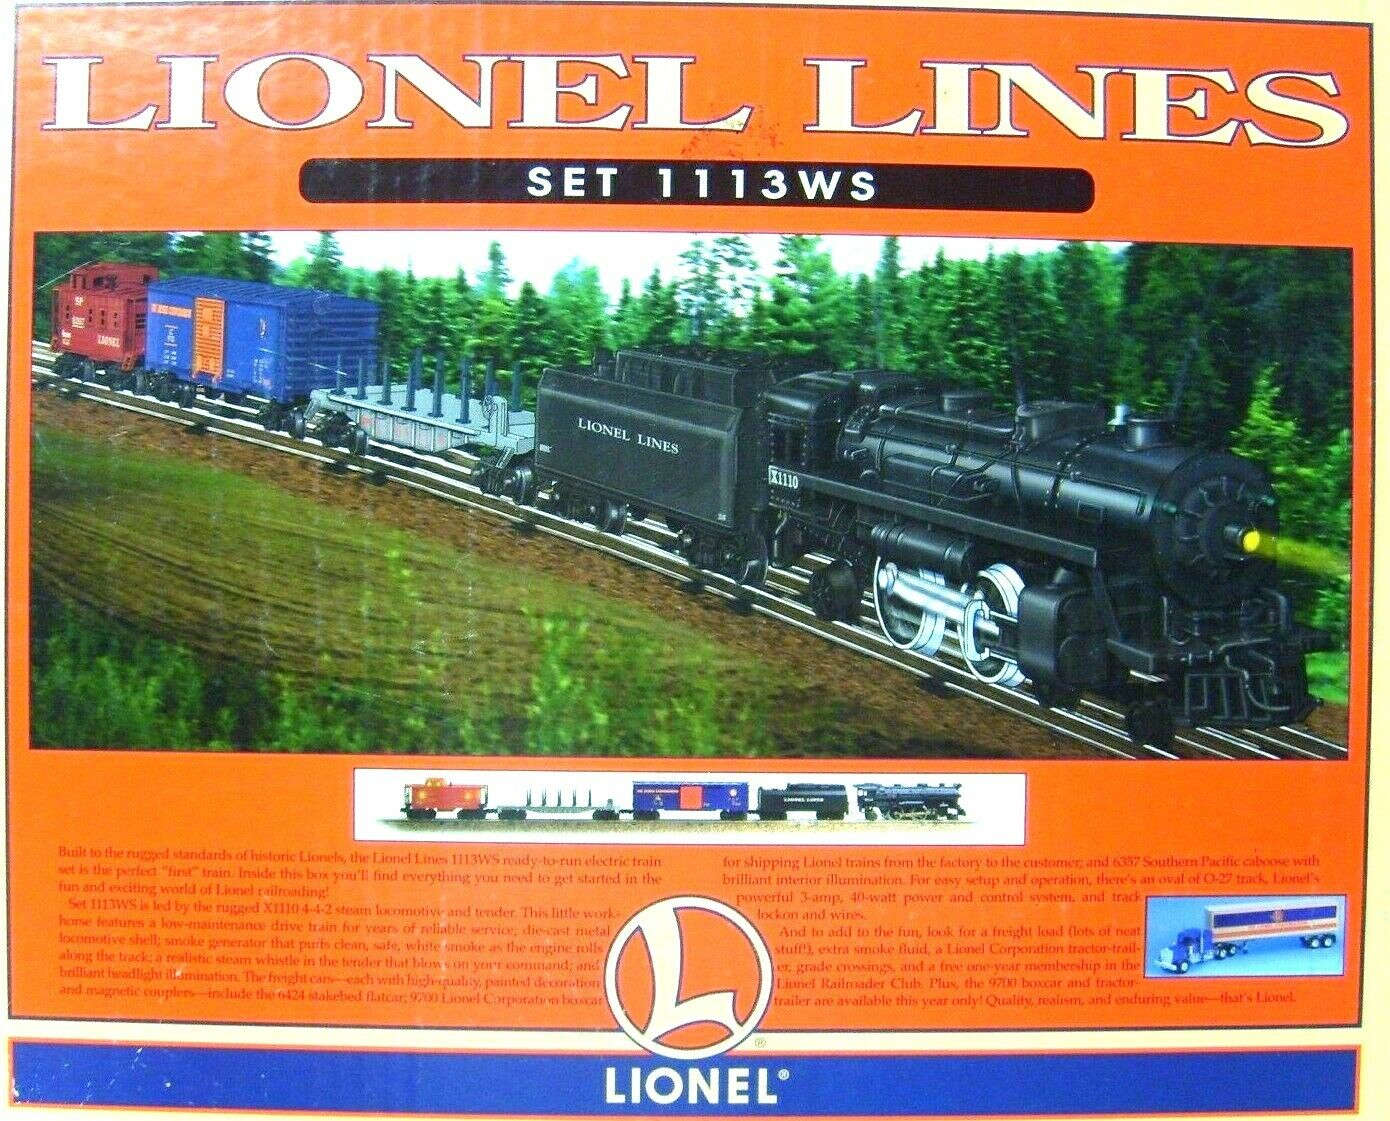 LIONEL 6-11910 LIONEL LINES TRAIN SET 1113WS    NEW